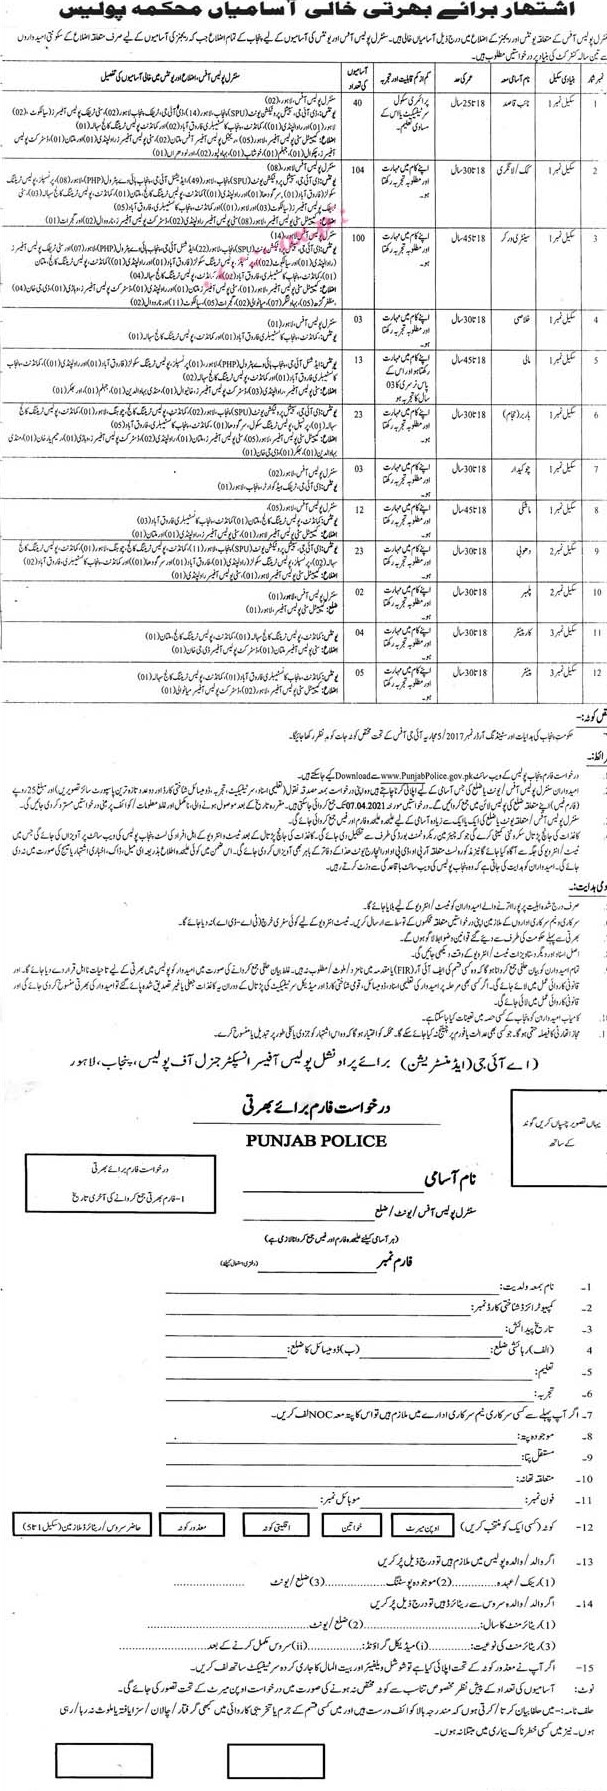 Punjab-police-jobs-2021